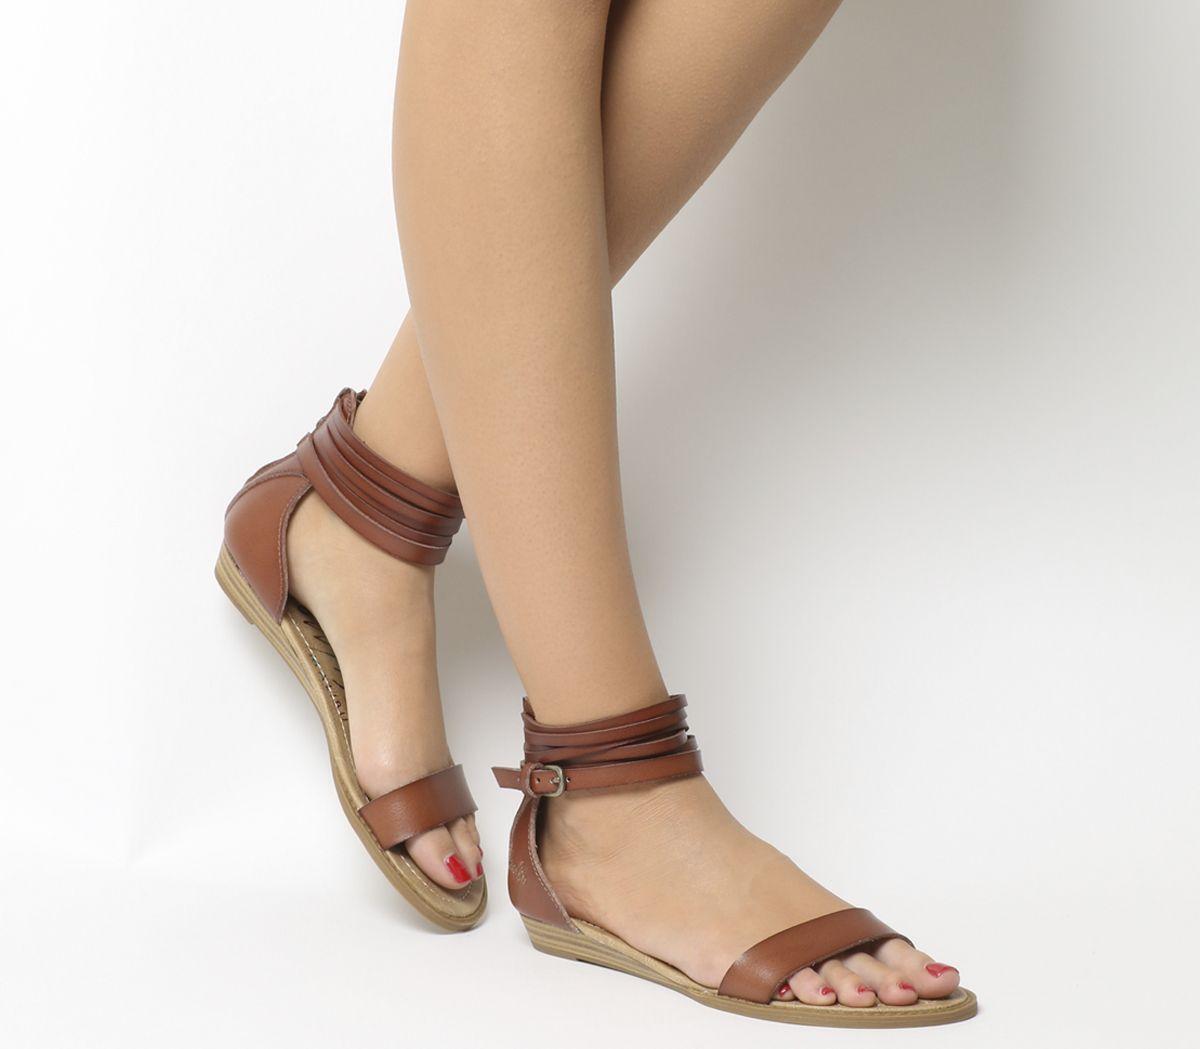 c240178771 Blowfish Becha Sandals Clay Dyecut - Sandals